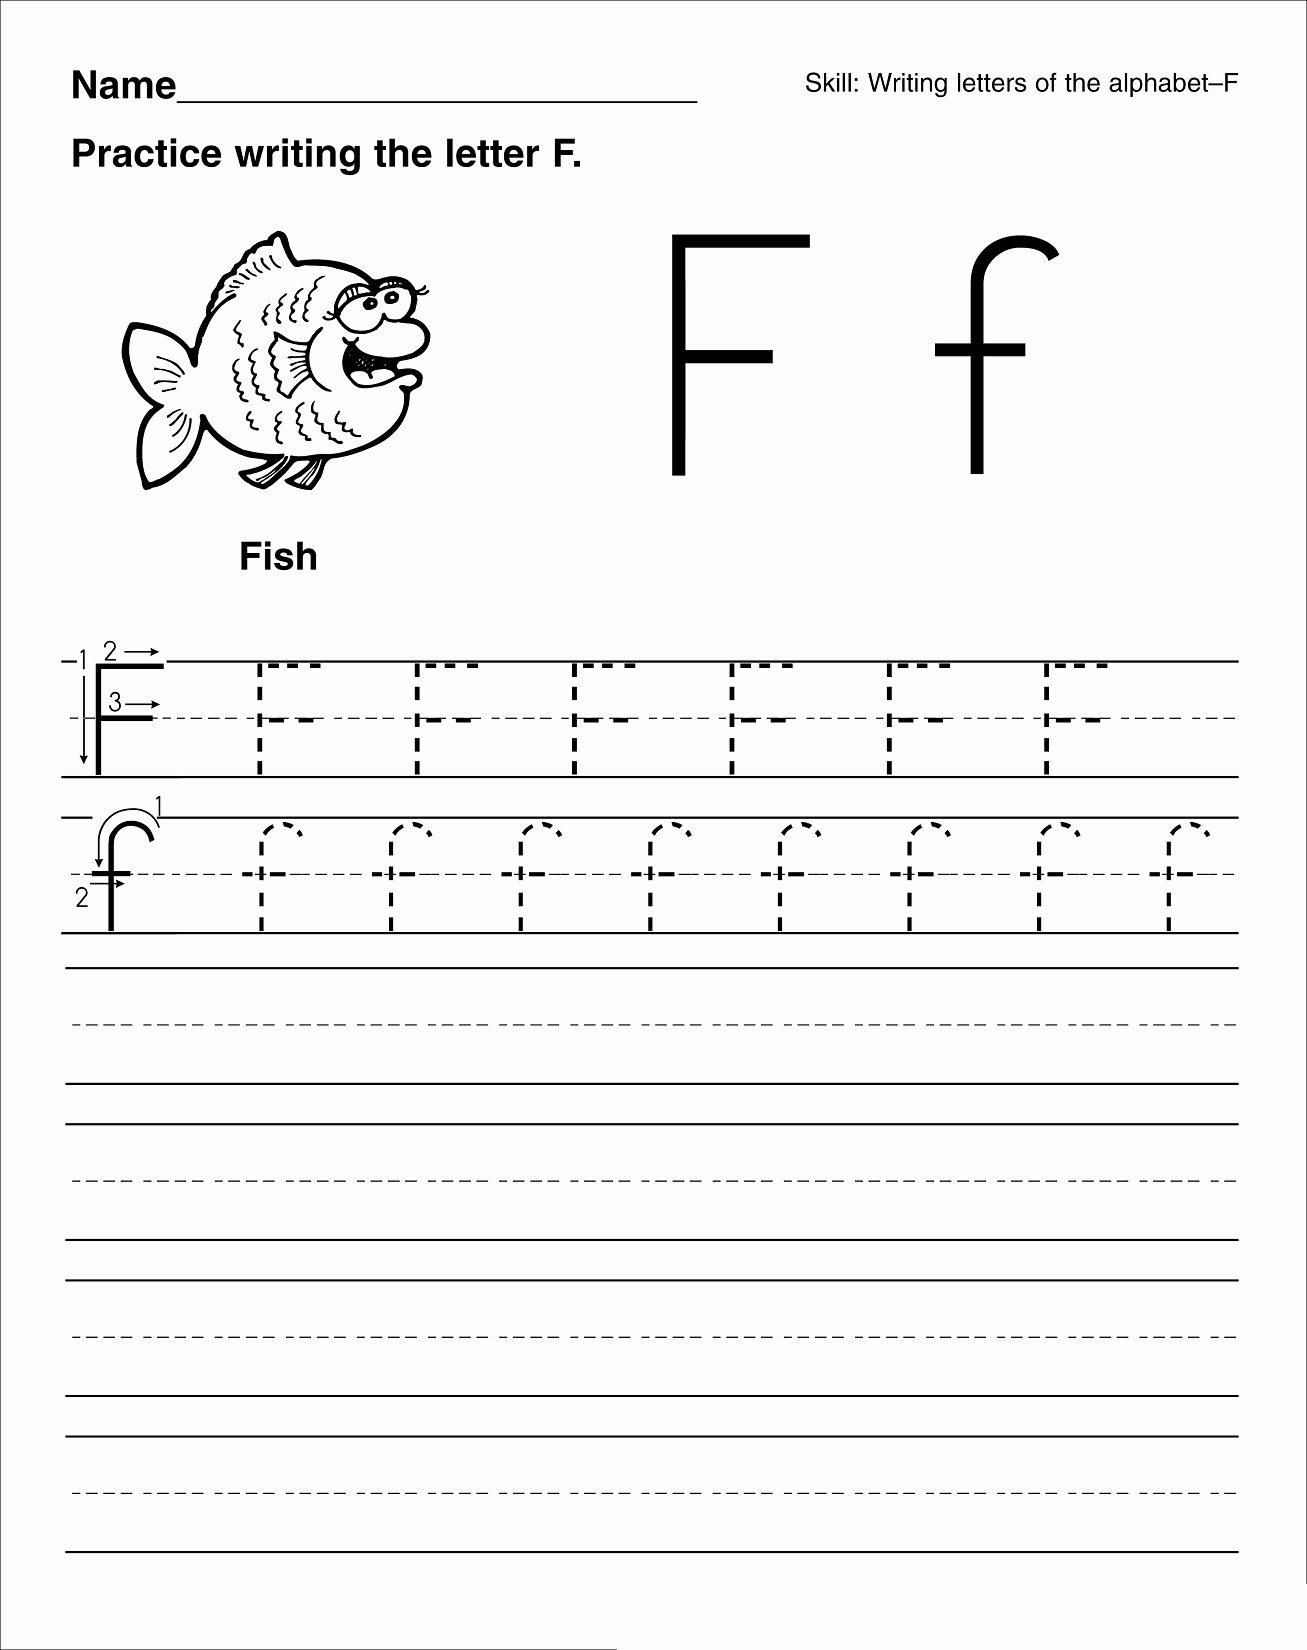 Practice Letter Worksheets for Preschoolers Lovely Worksheets Math Worksheet Printing Letters Worksheets